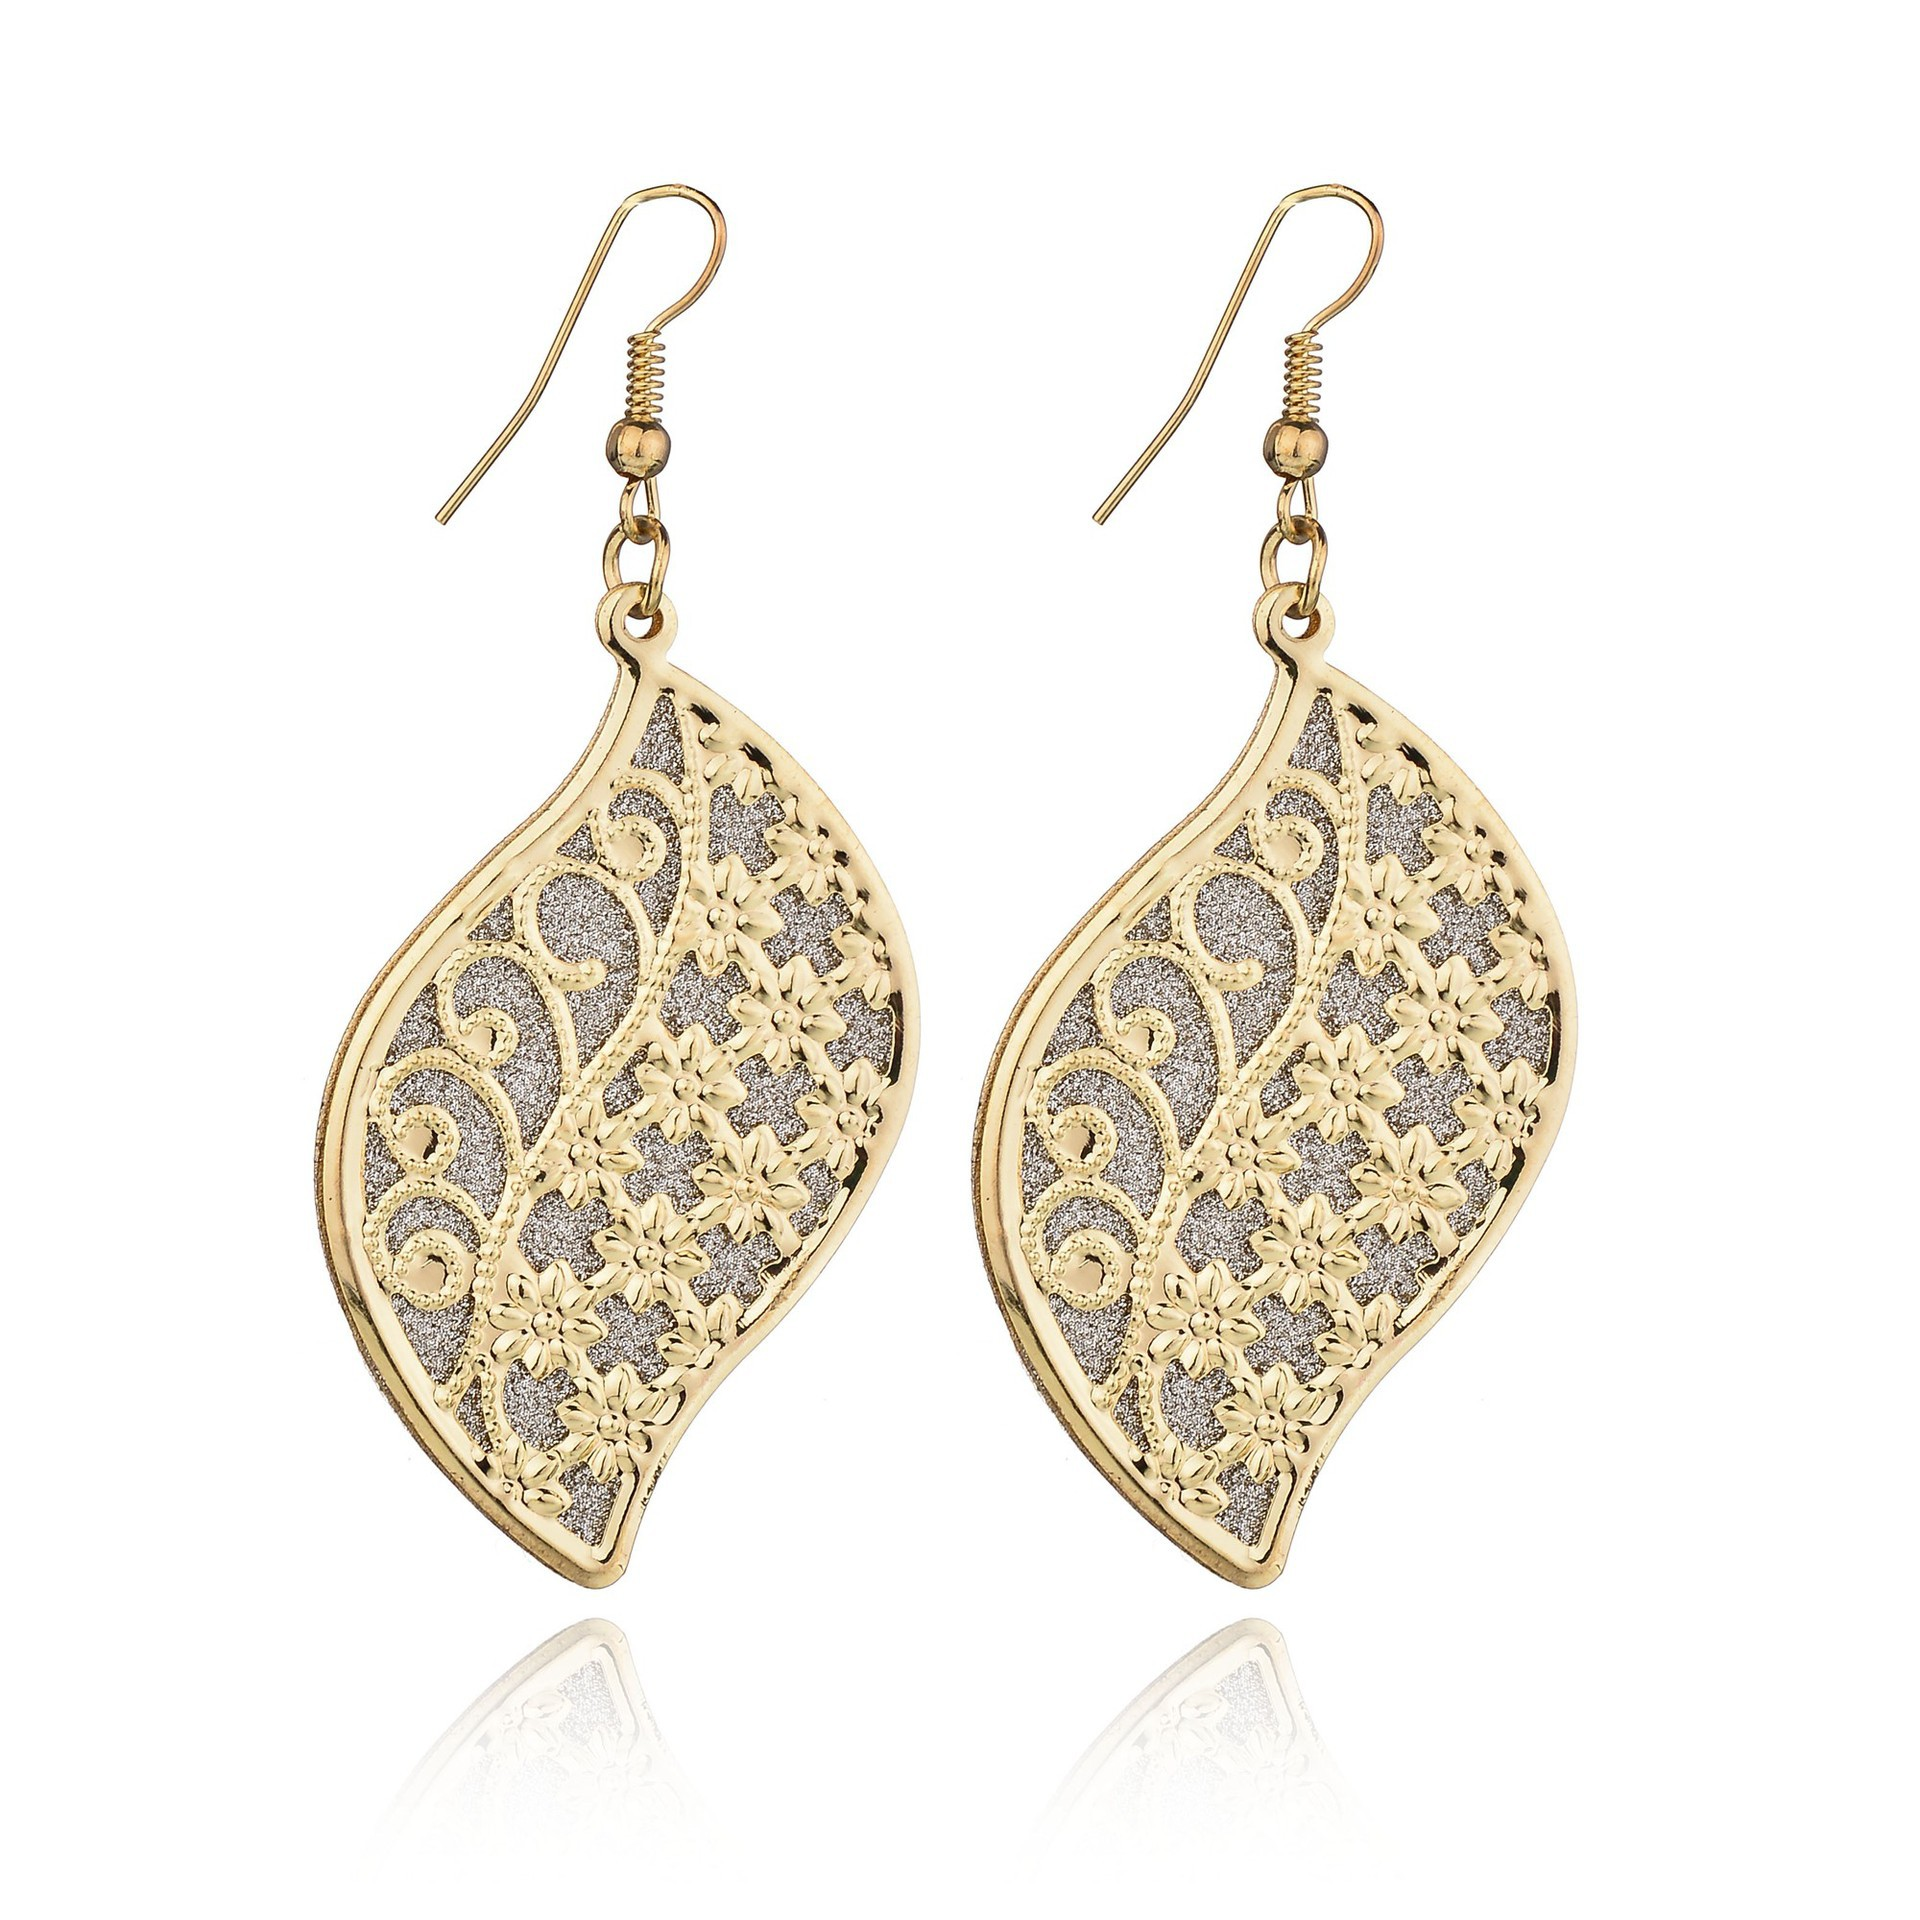 Boho Gold Silver Color Long Big Leaves Hollow Flower Dangle Earrings Pendant Clasps Drop Earring For Women Fashion Jewelry